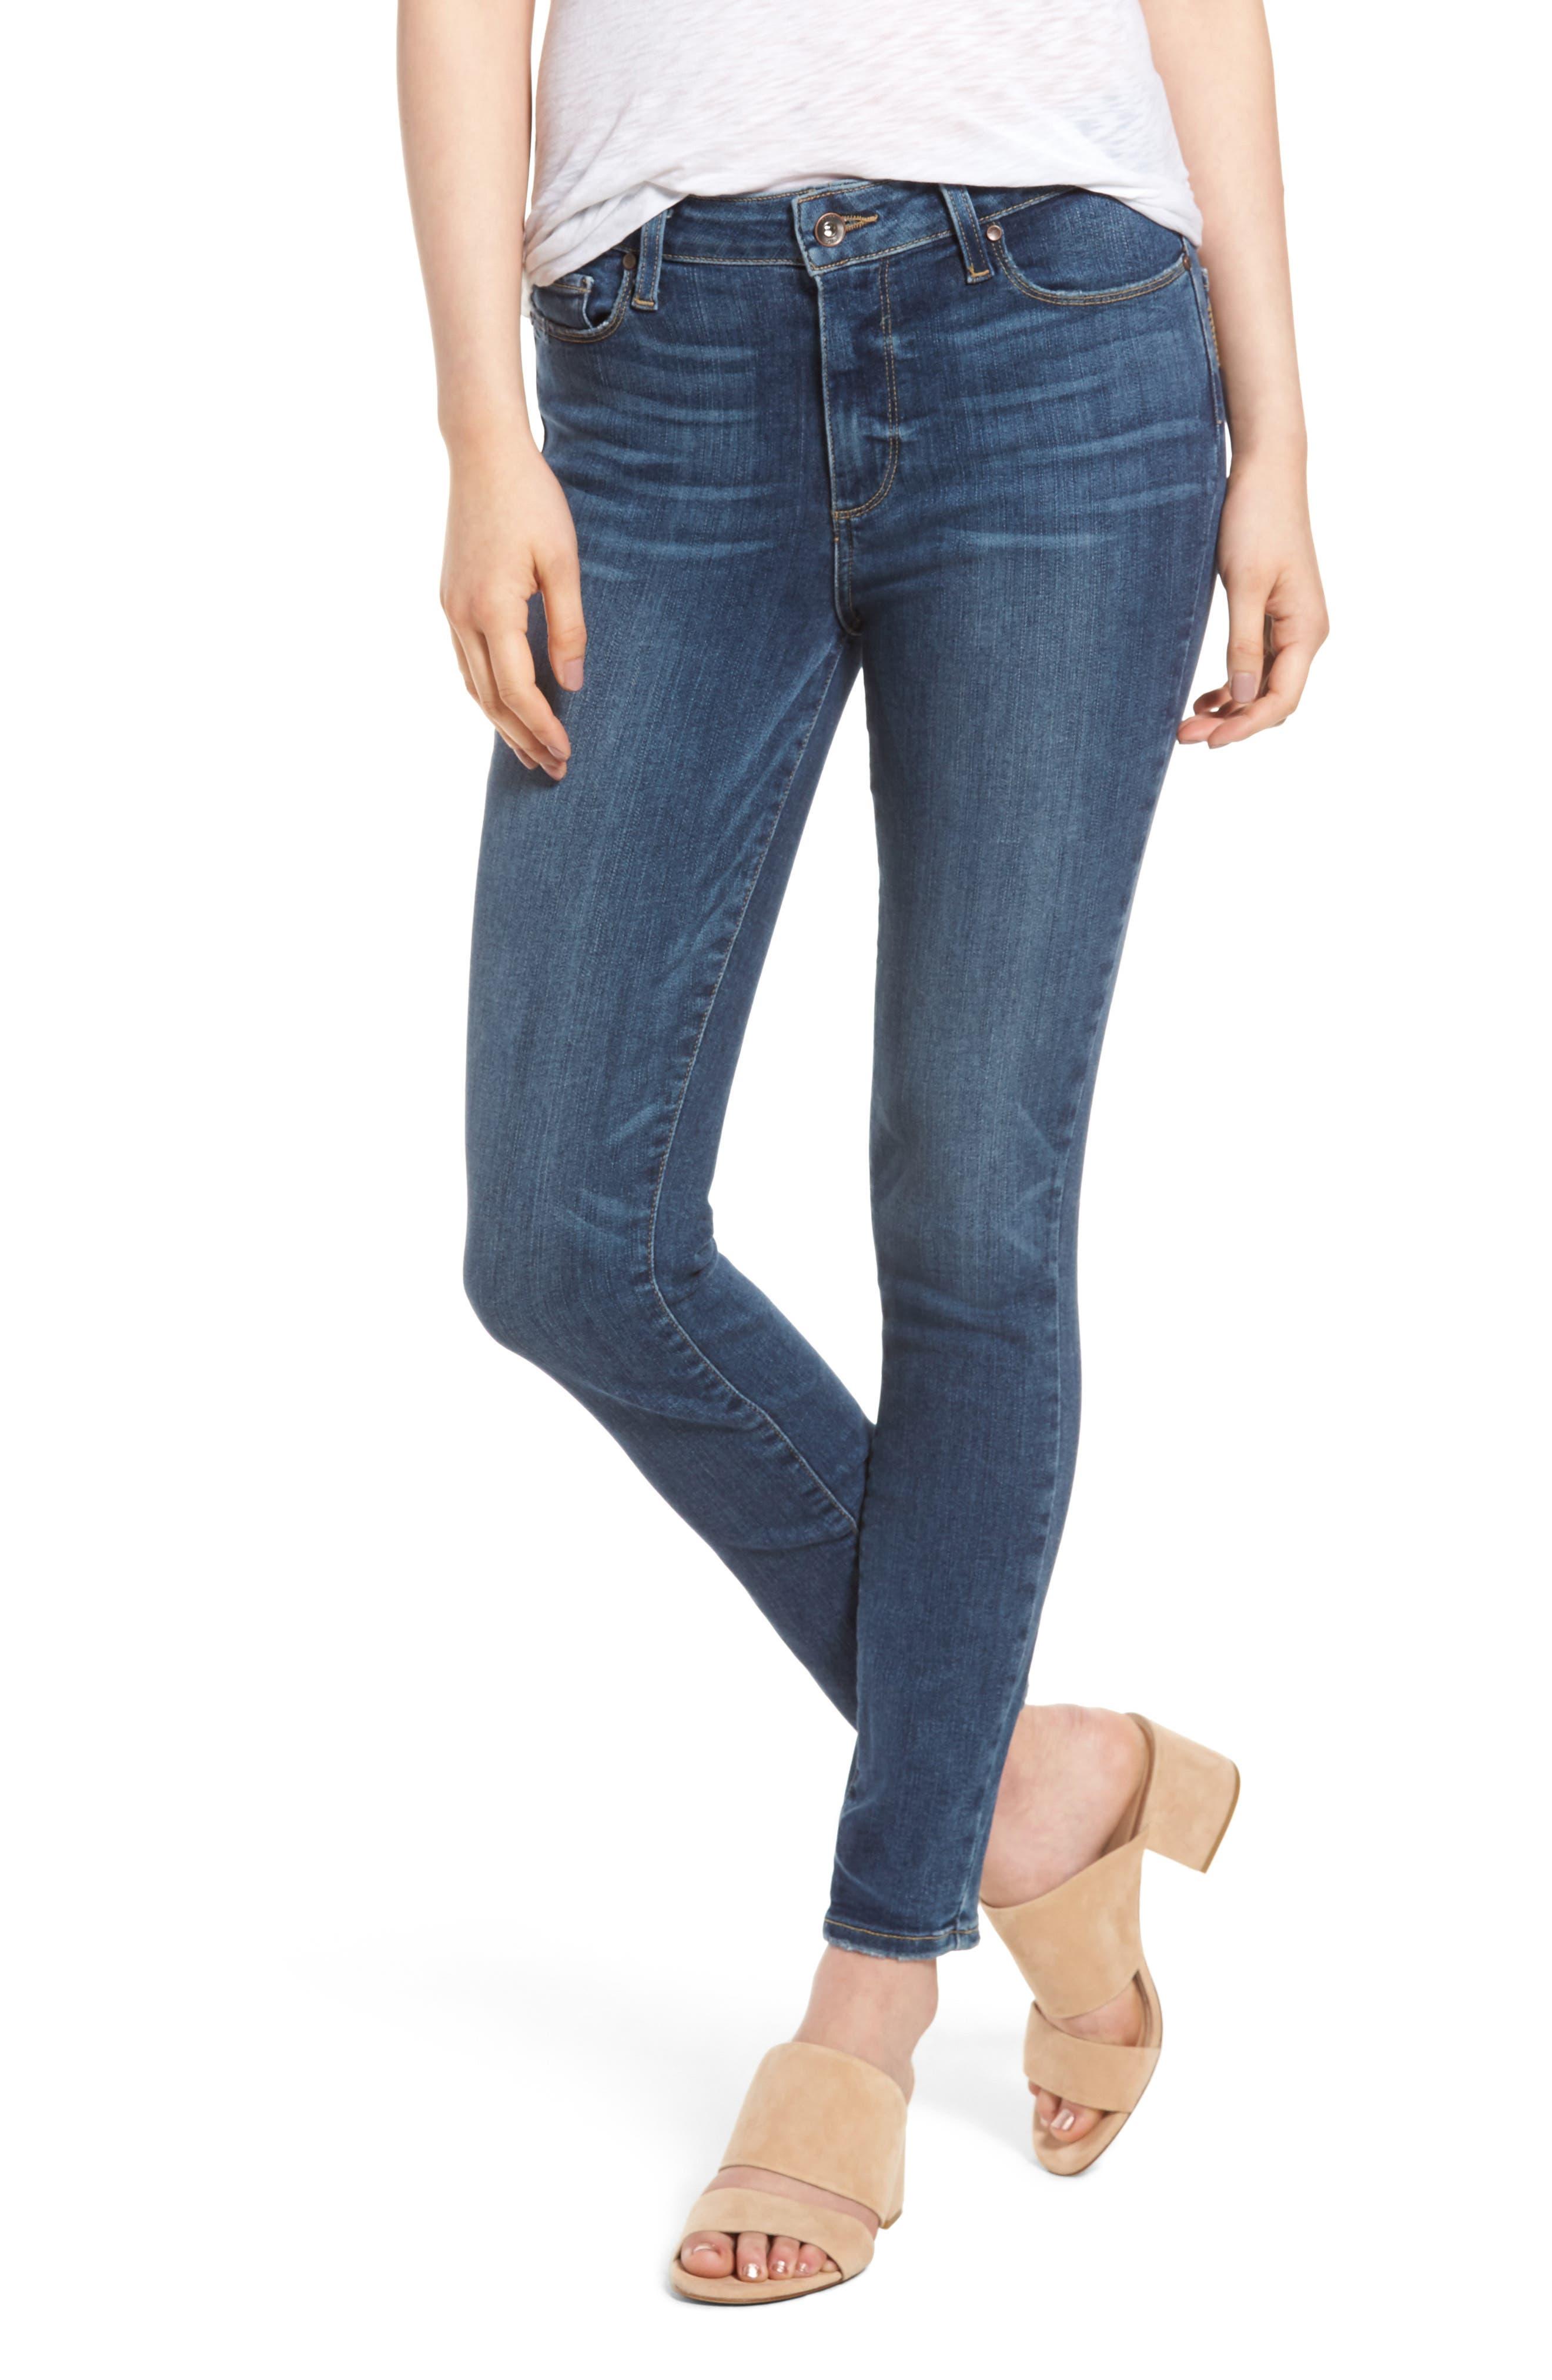 Alternate Image 1 Selected - PAIGE Hoxton High Waist Ankle Skinny Jeans (Kiana)